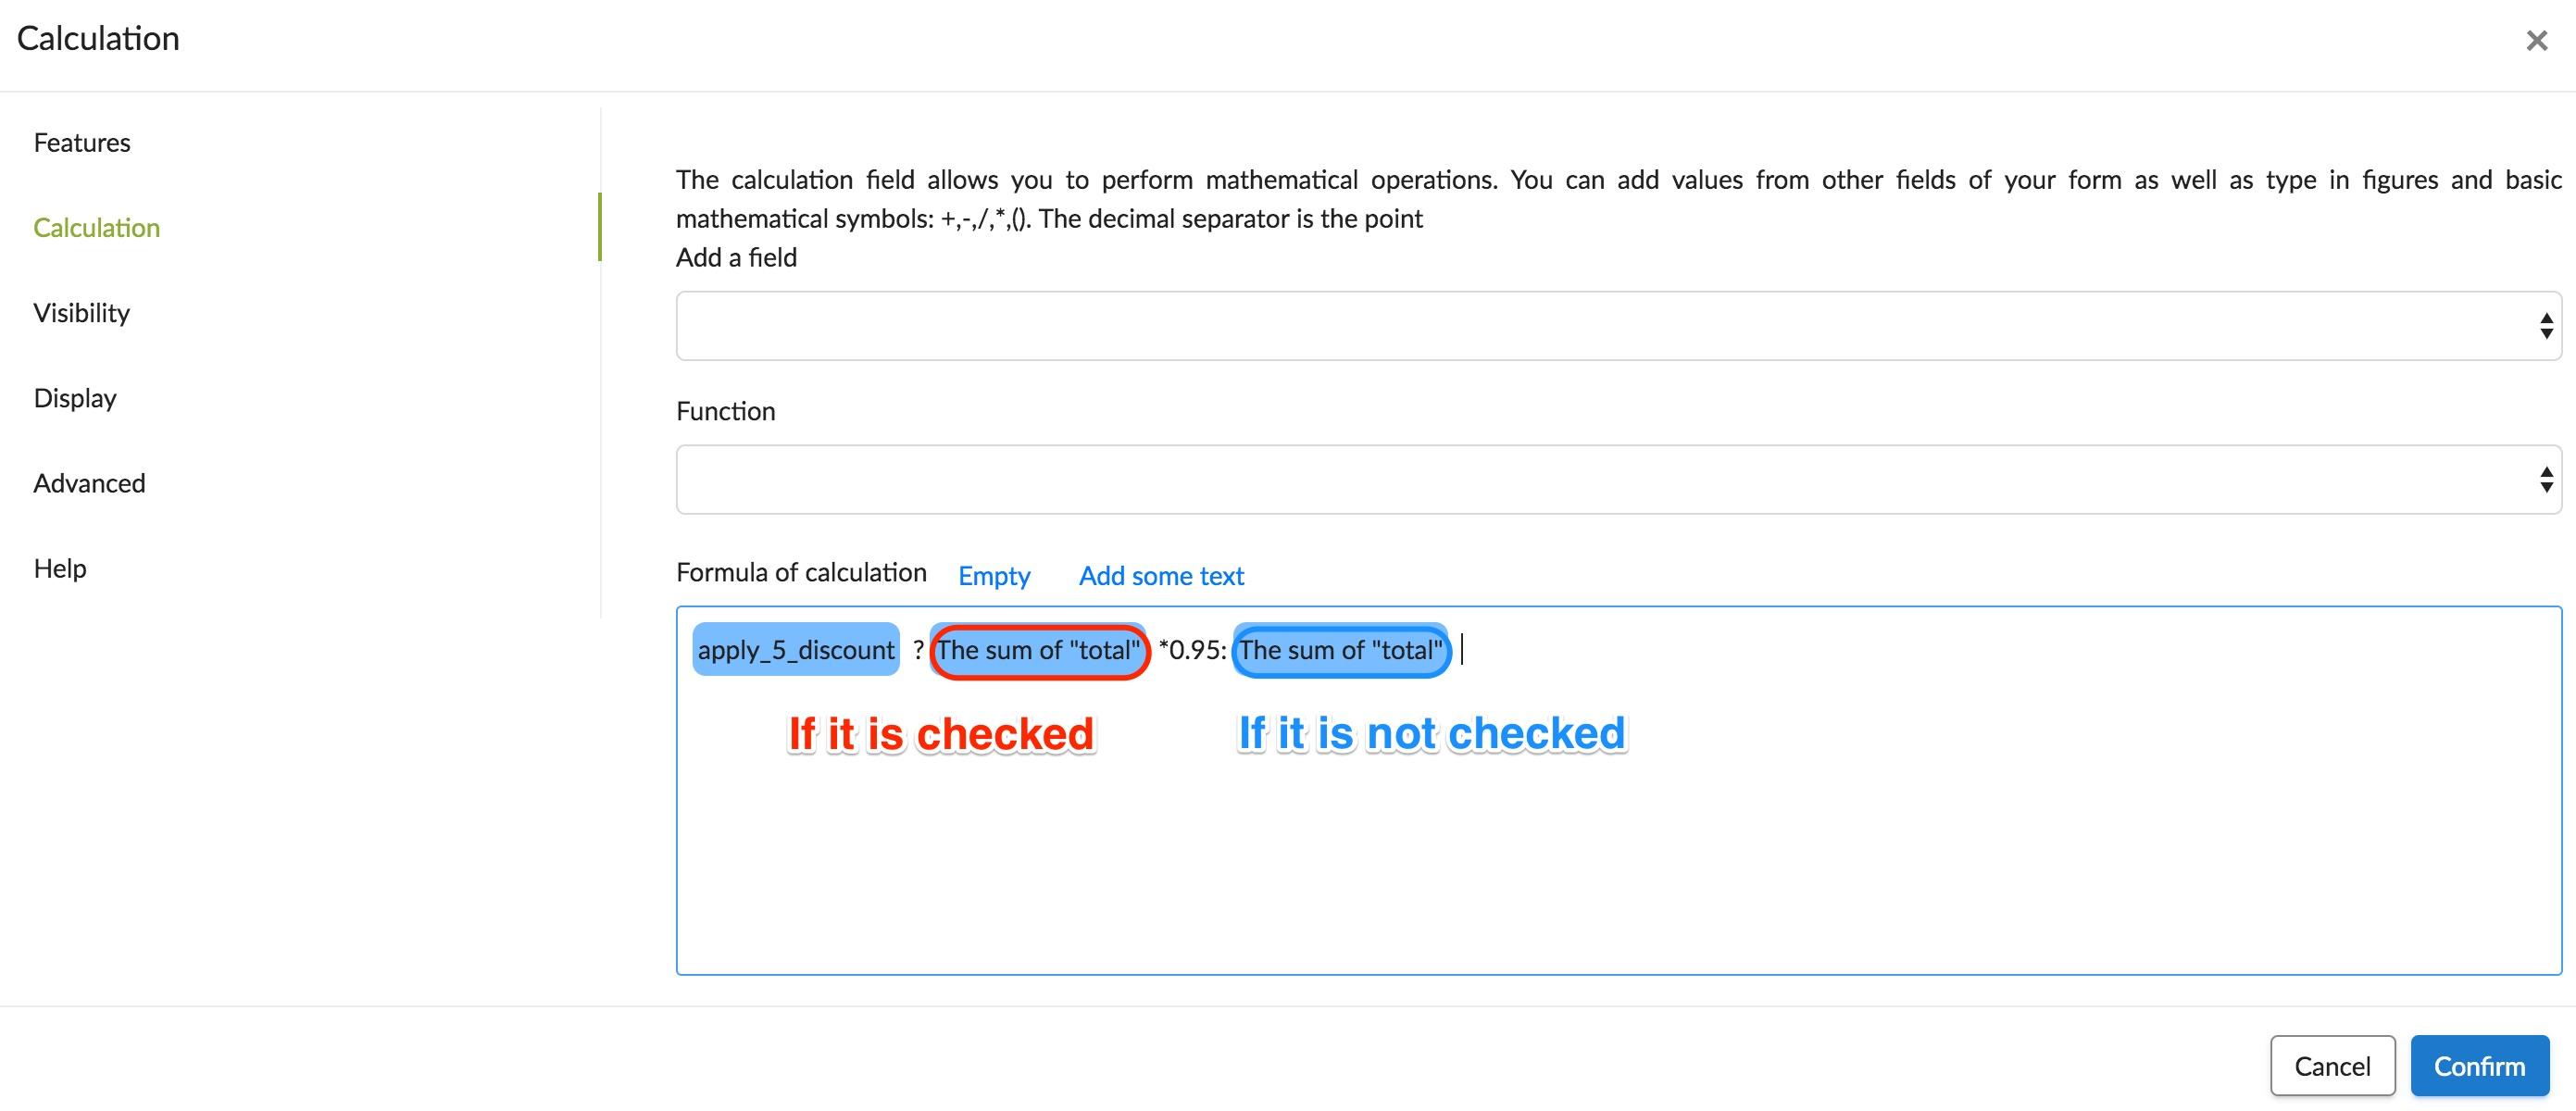 conditional calcuation for checkbox